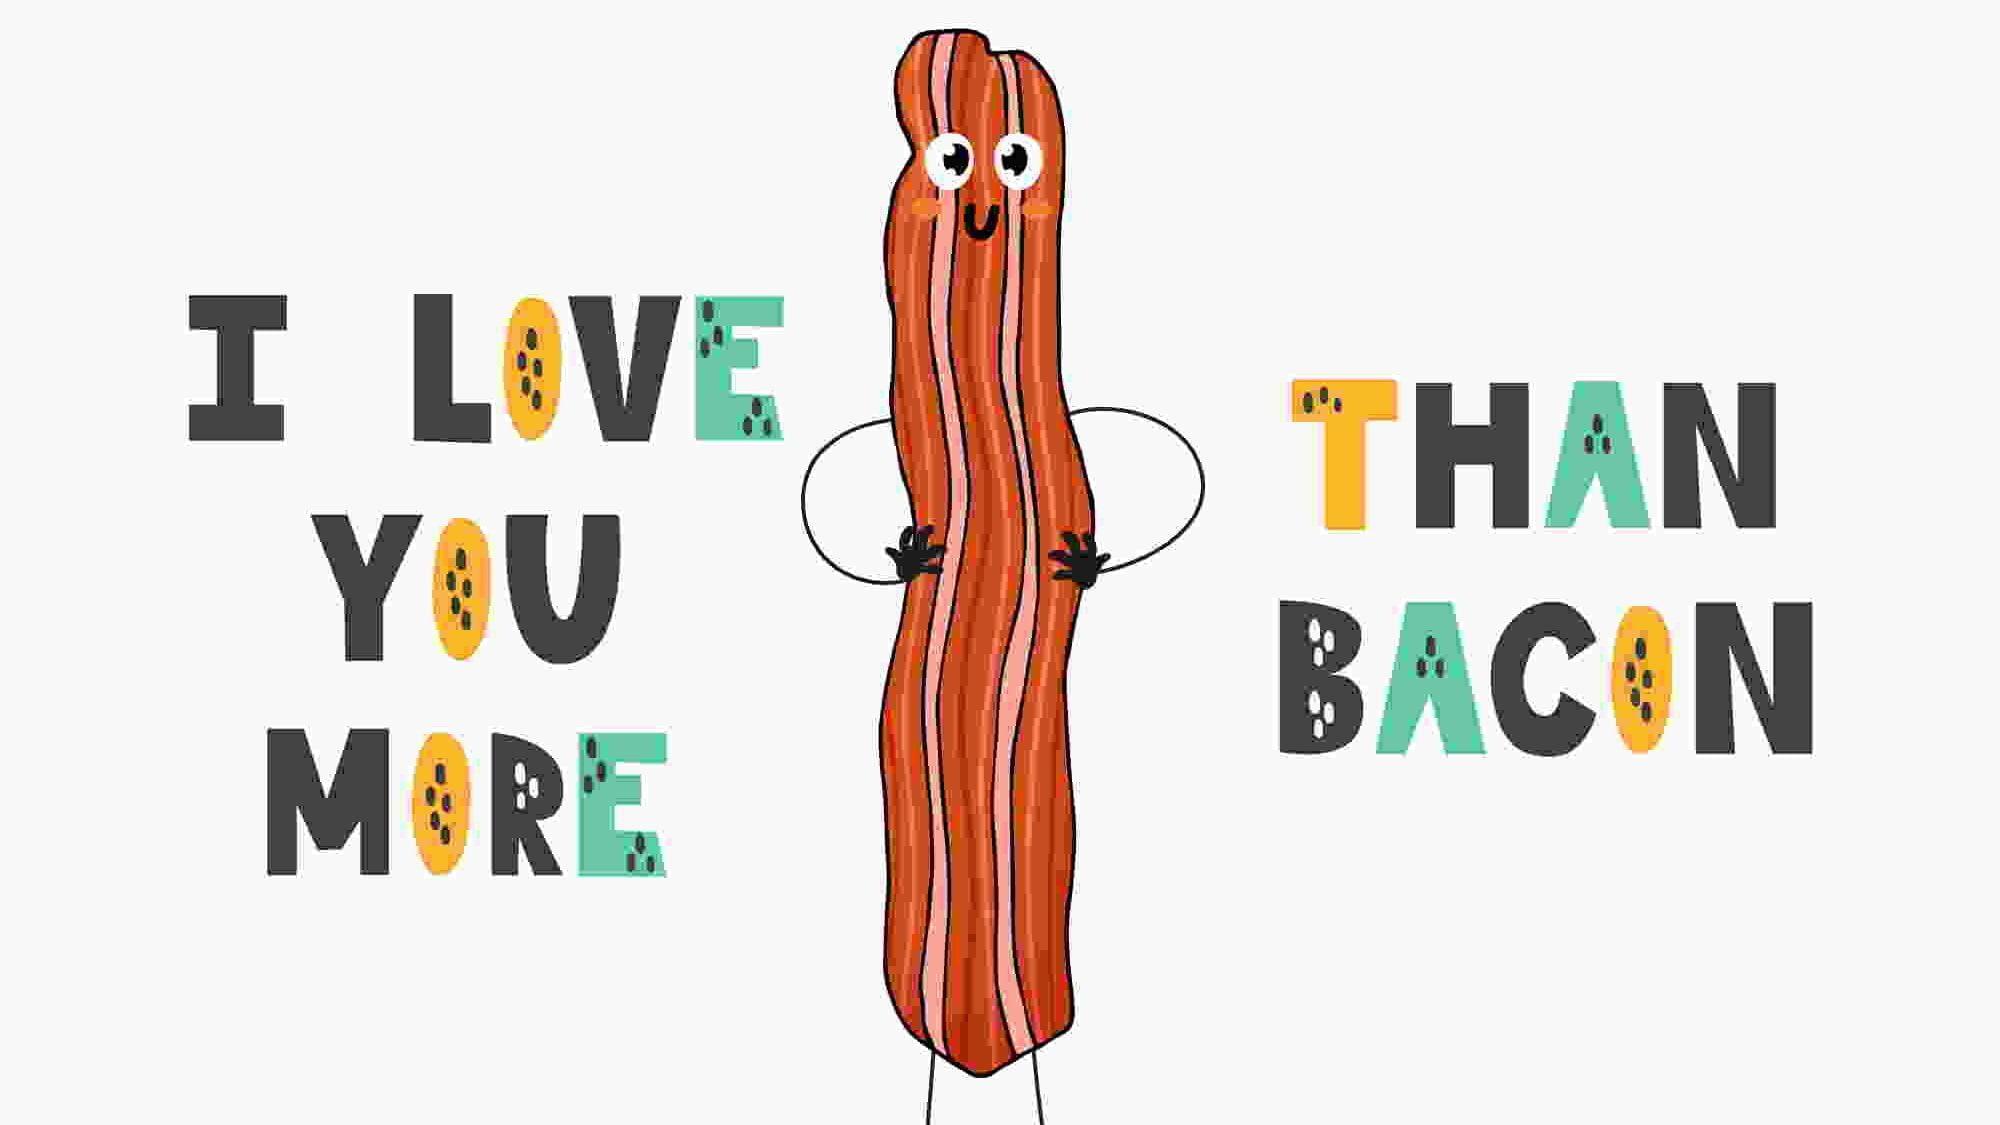 Comparaciones en inglés I love you more than bacon